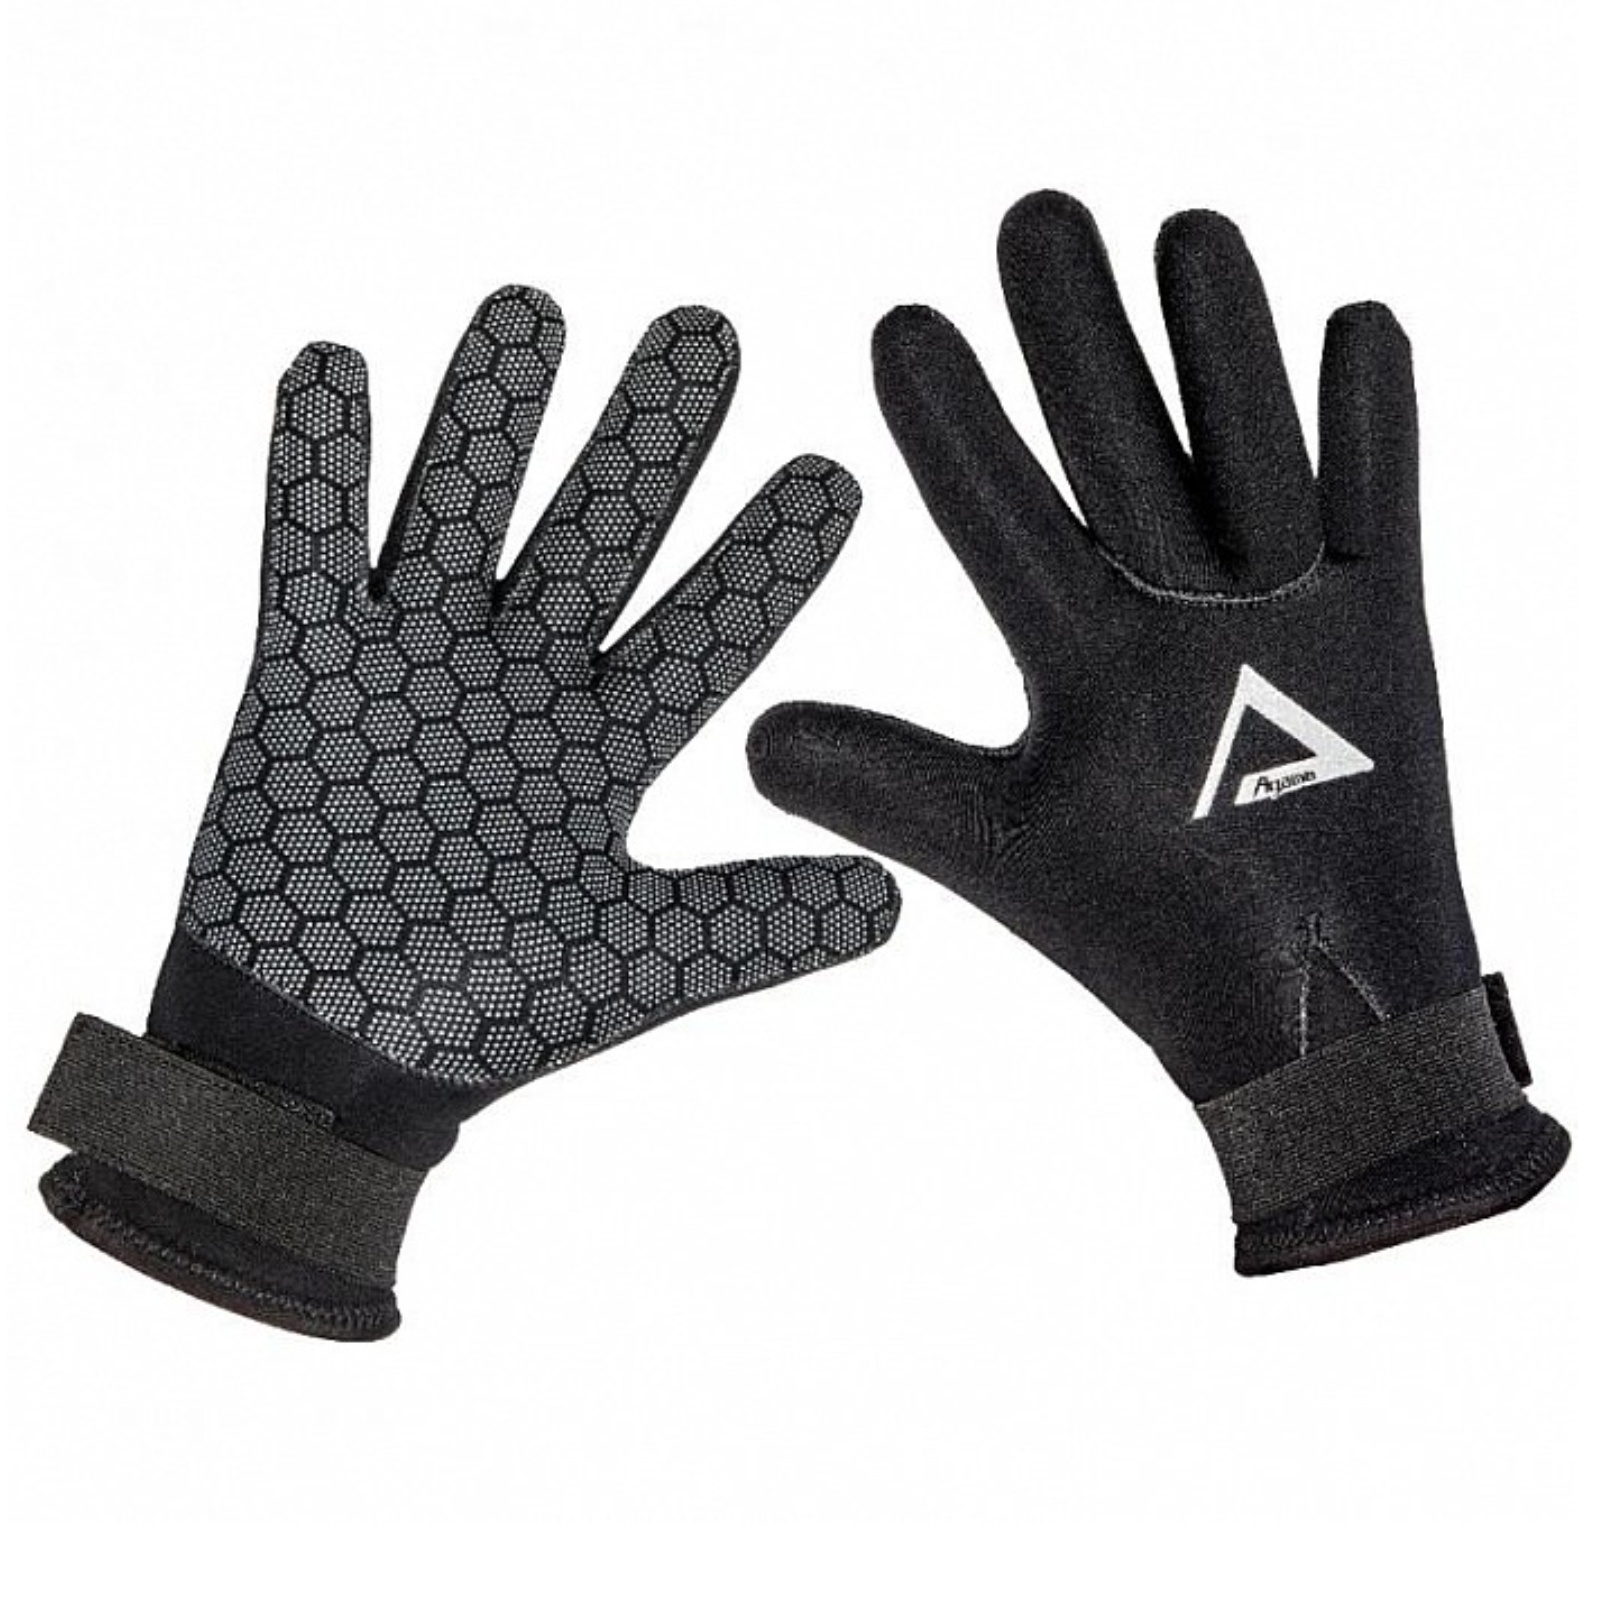 Neoprenové rukavice AGAMA Superstretch 5 mm - vel. L